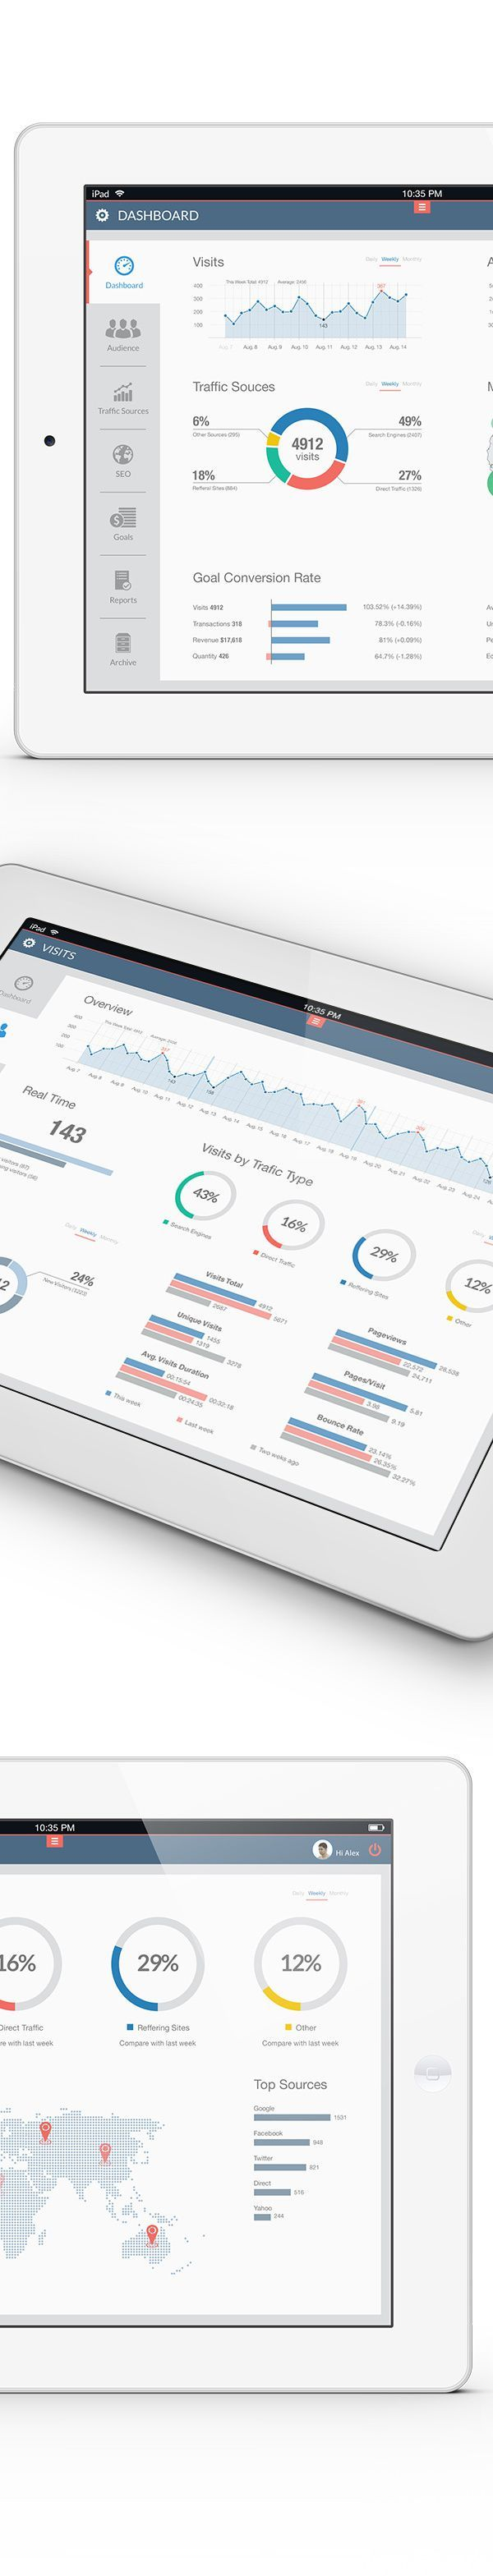 Website Analytics App by Alex Tarloyan, via Behance